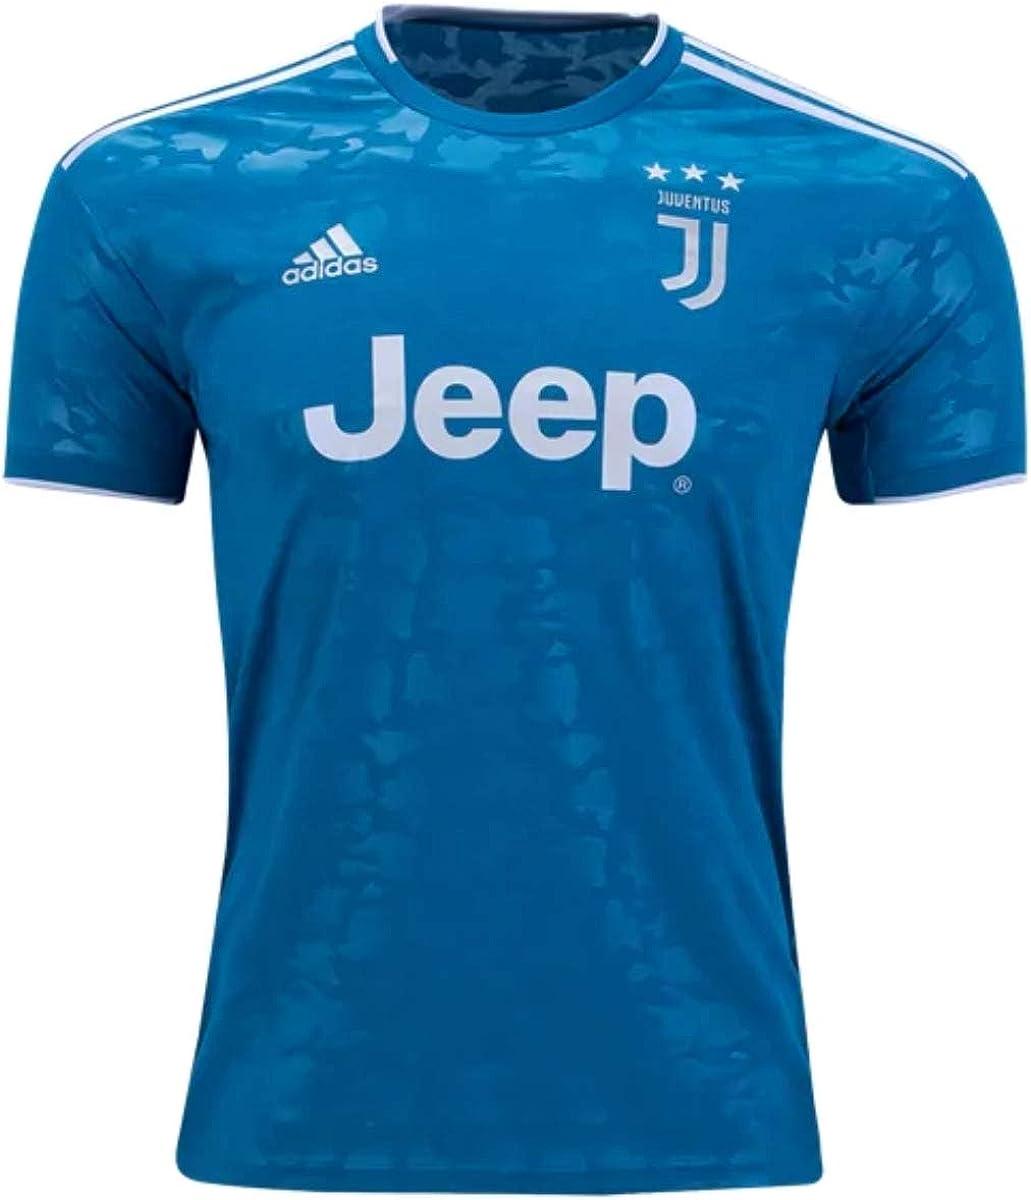 Amazon Com Adidas 19 20 Juventus 3rd Youth Jersey X Large Clothing